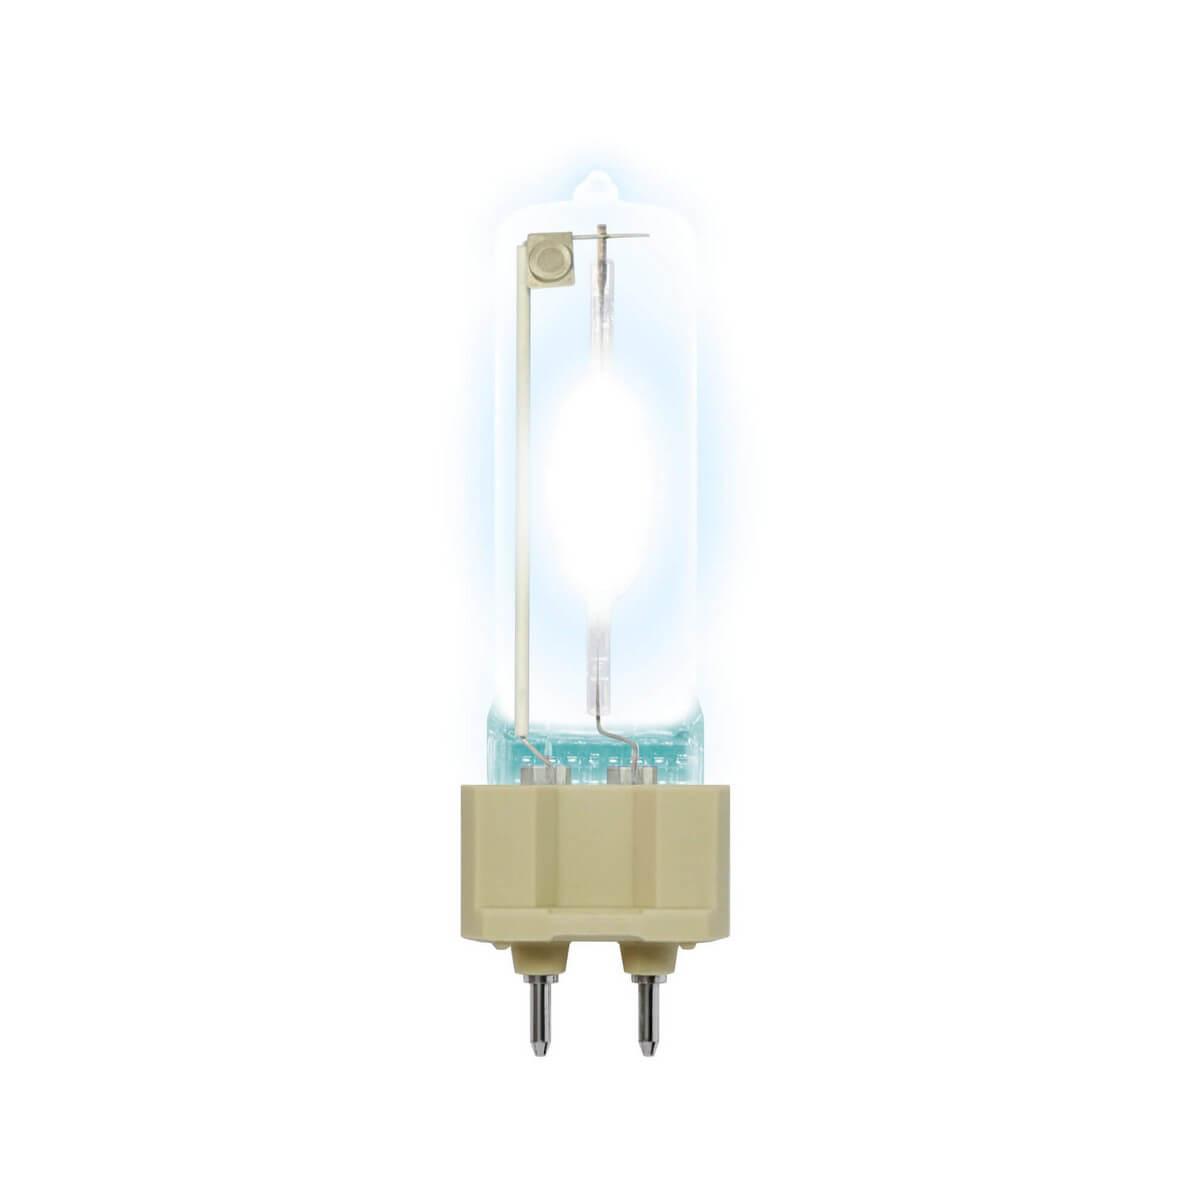 Лампочка Uniel MH-SE-150/4200/G12 MH-SE